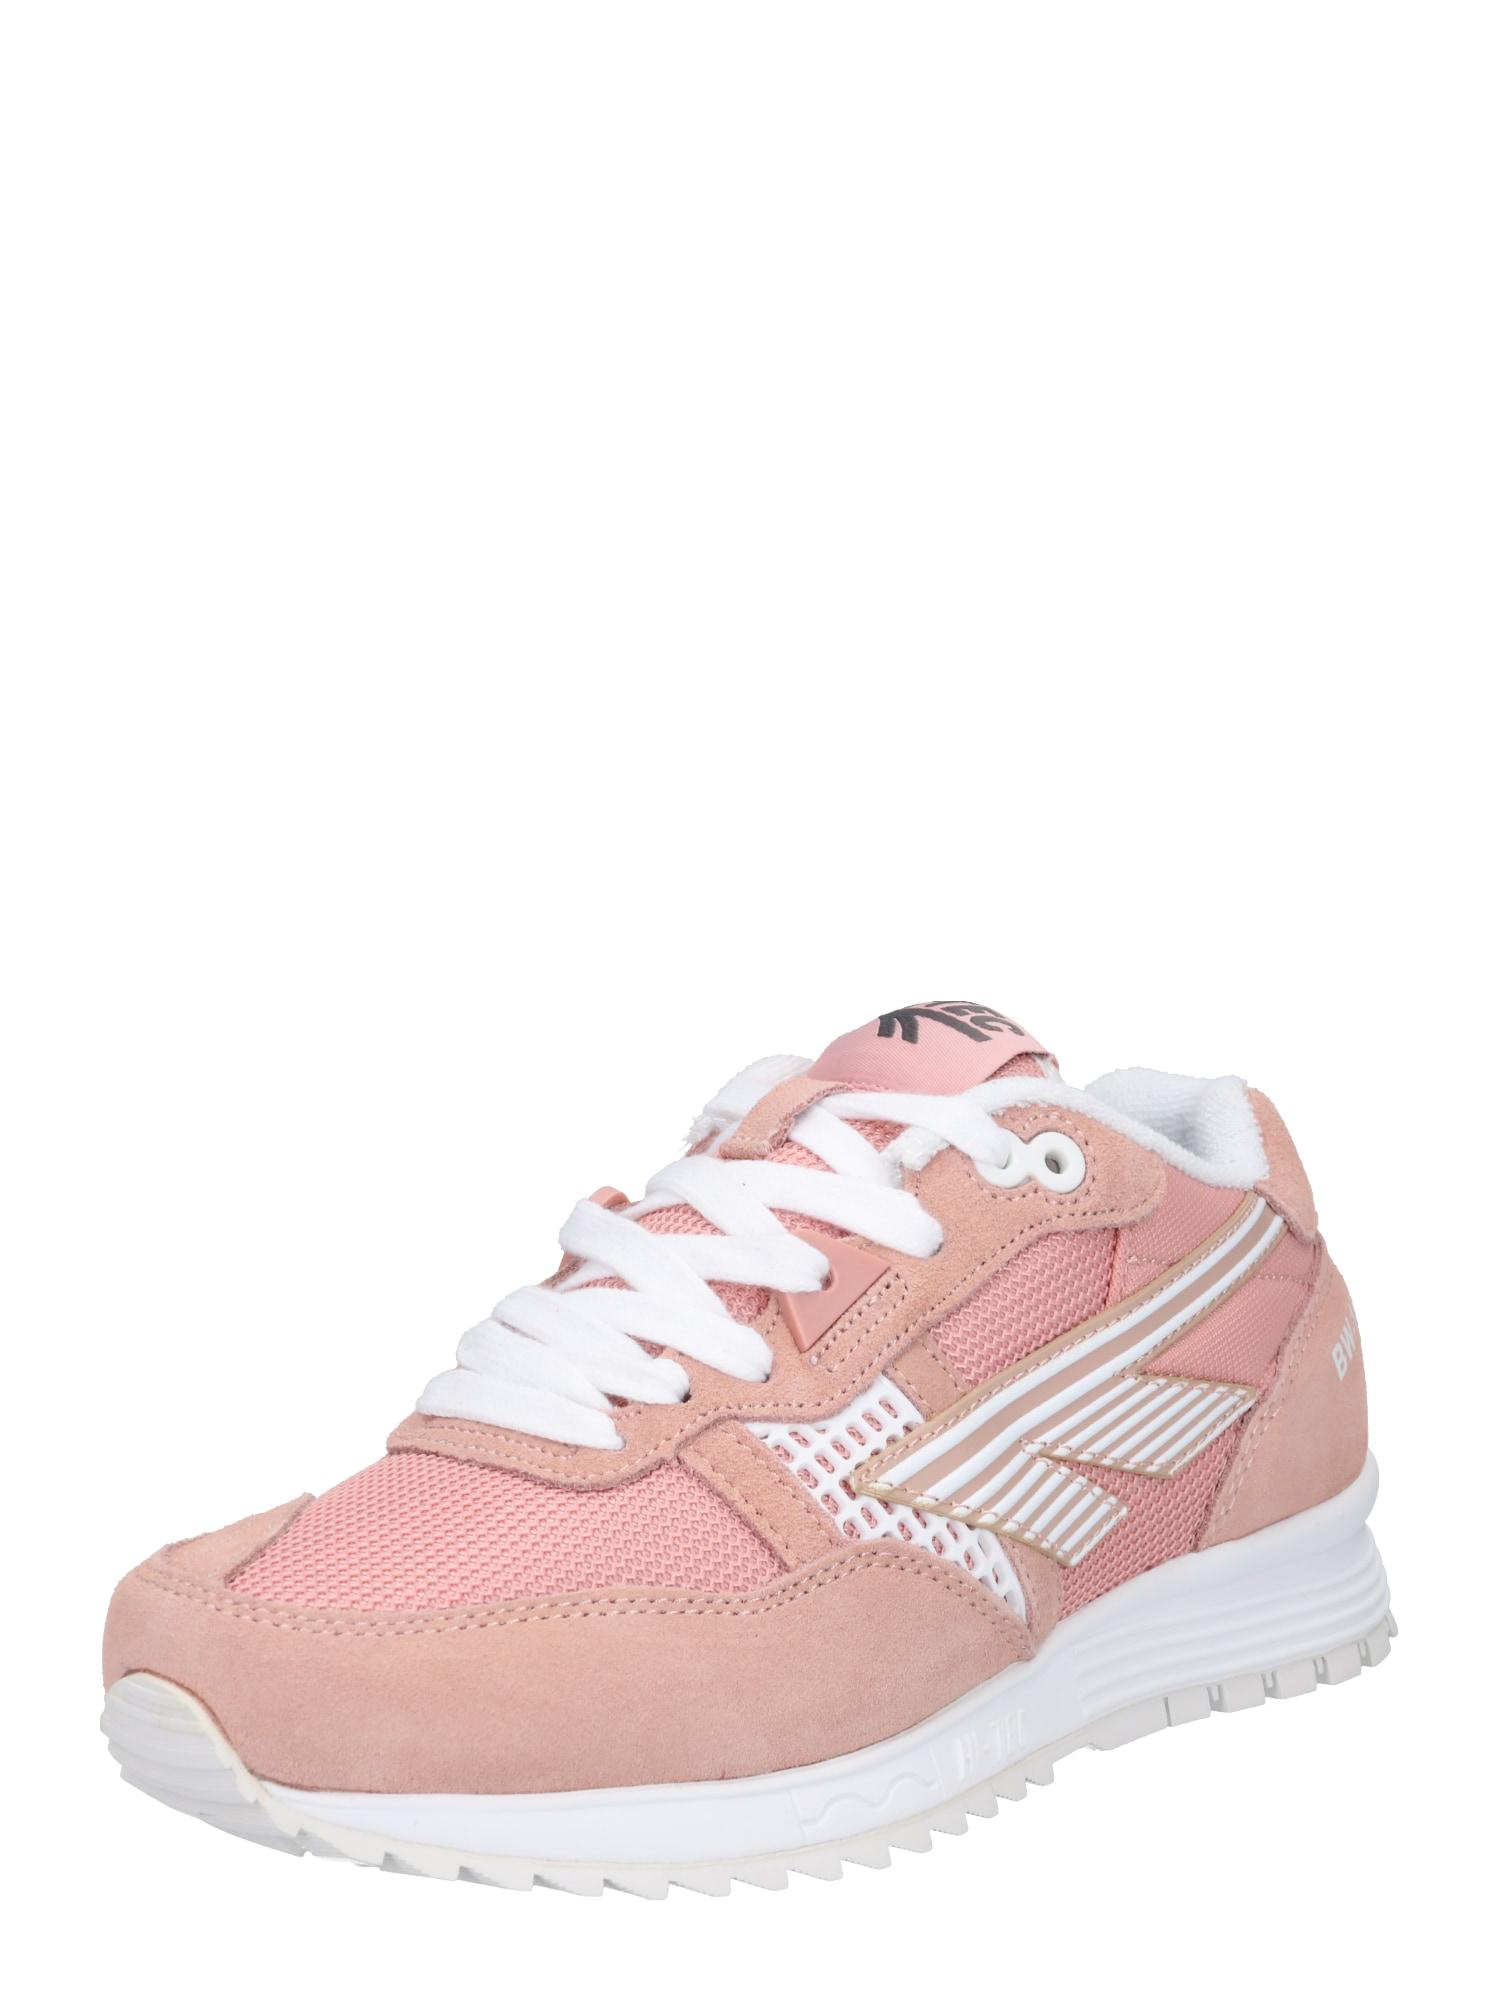 Tenisky S010002 růžová HI-TEC